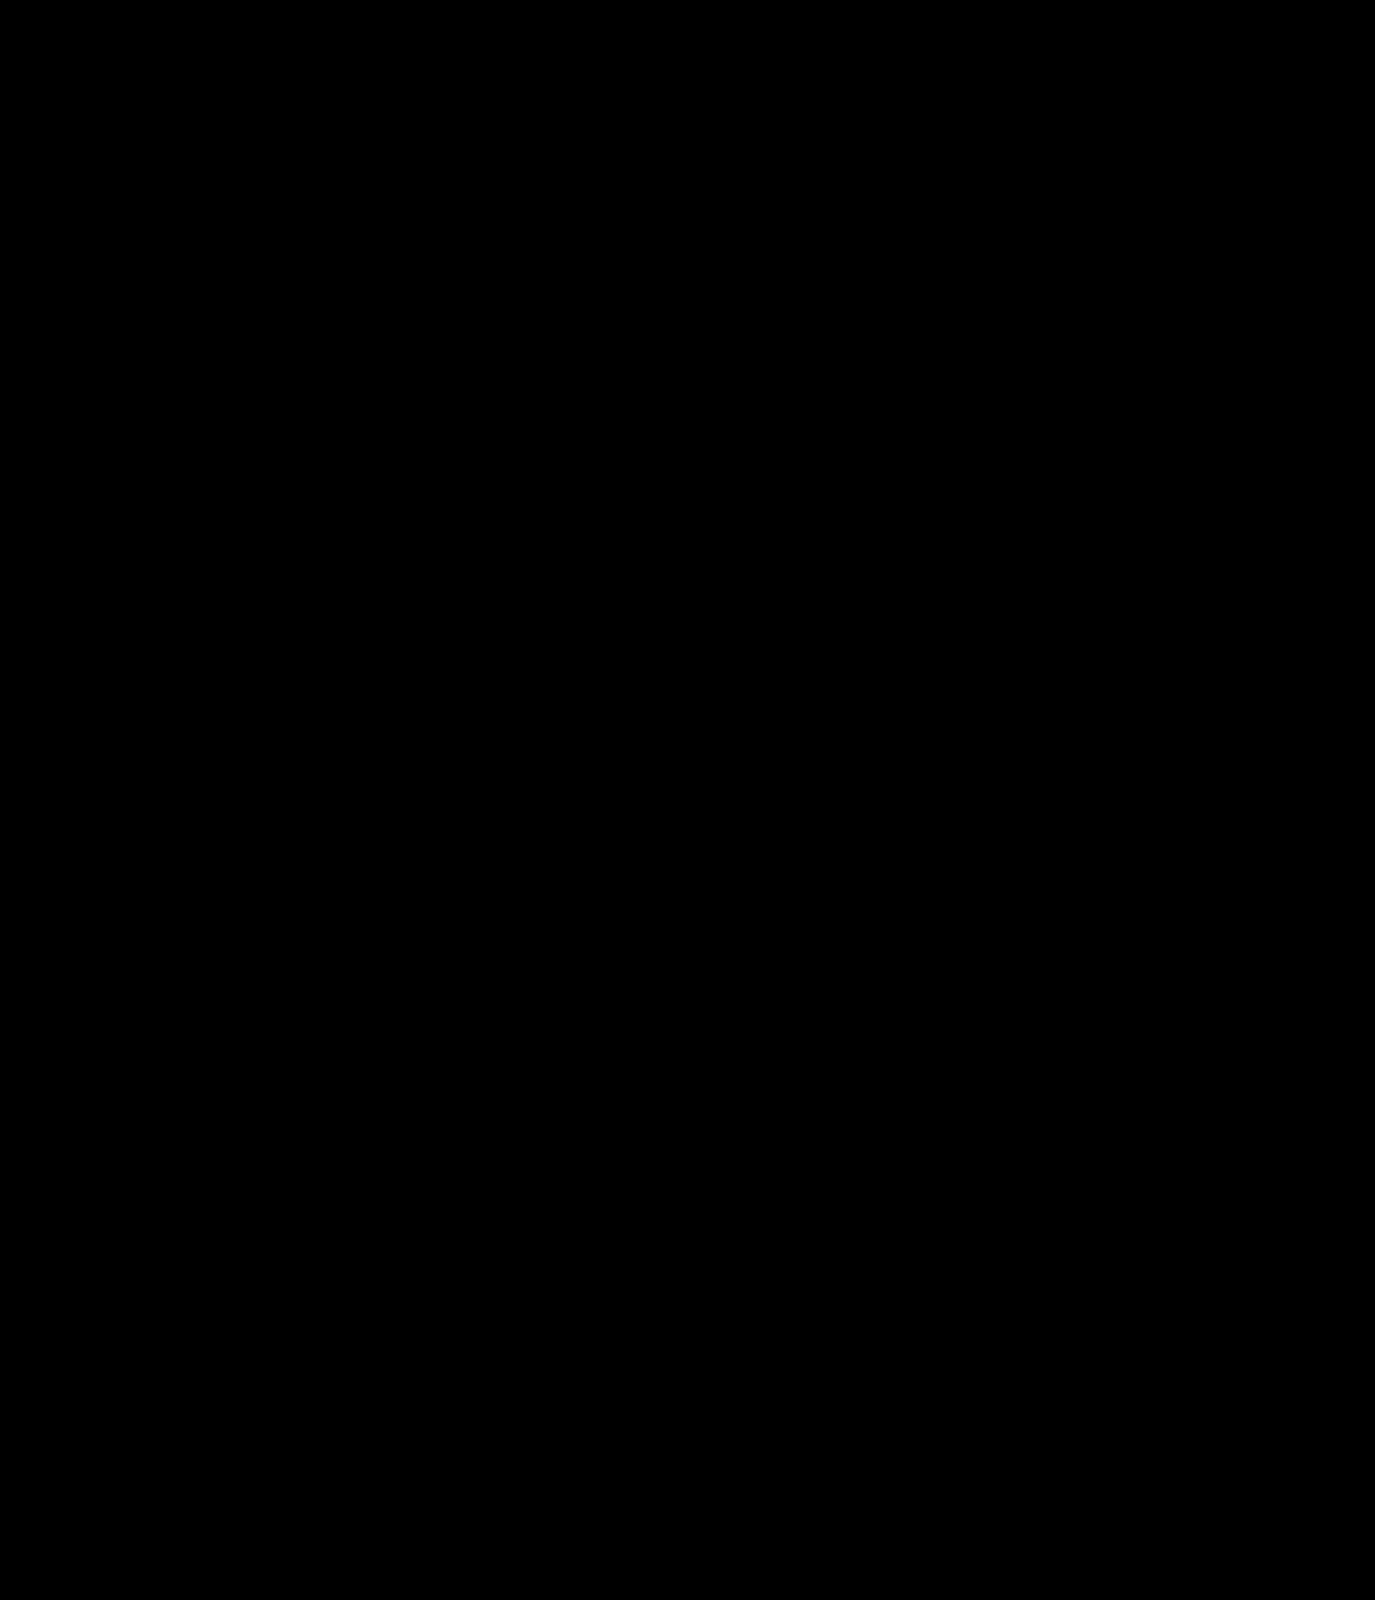 MALP pertenece a la Plataforma Palomera